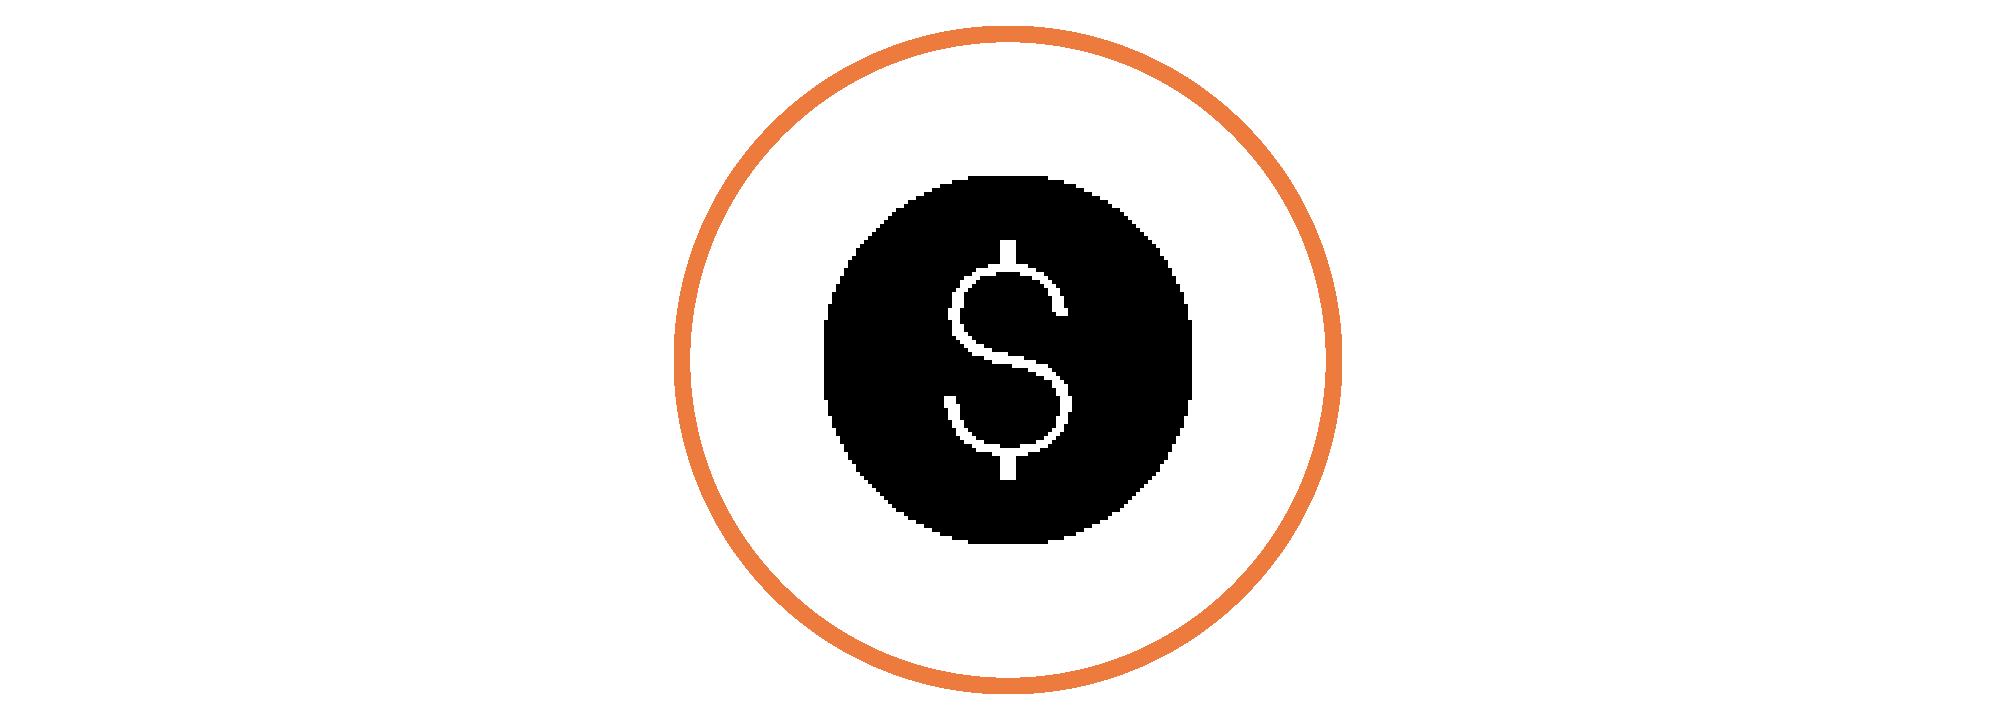 rewards-club-icon.png